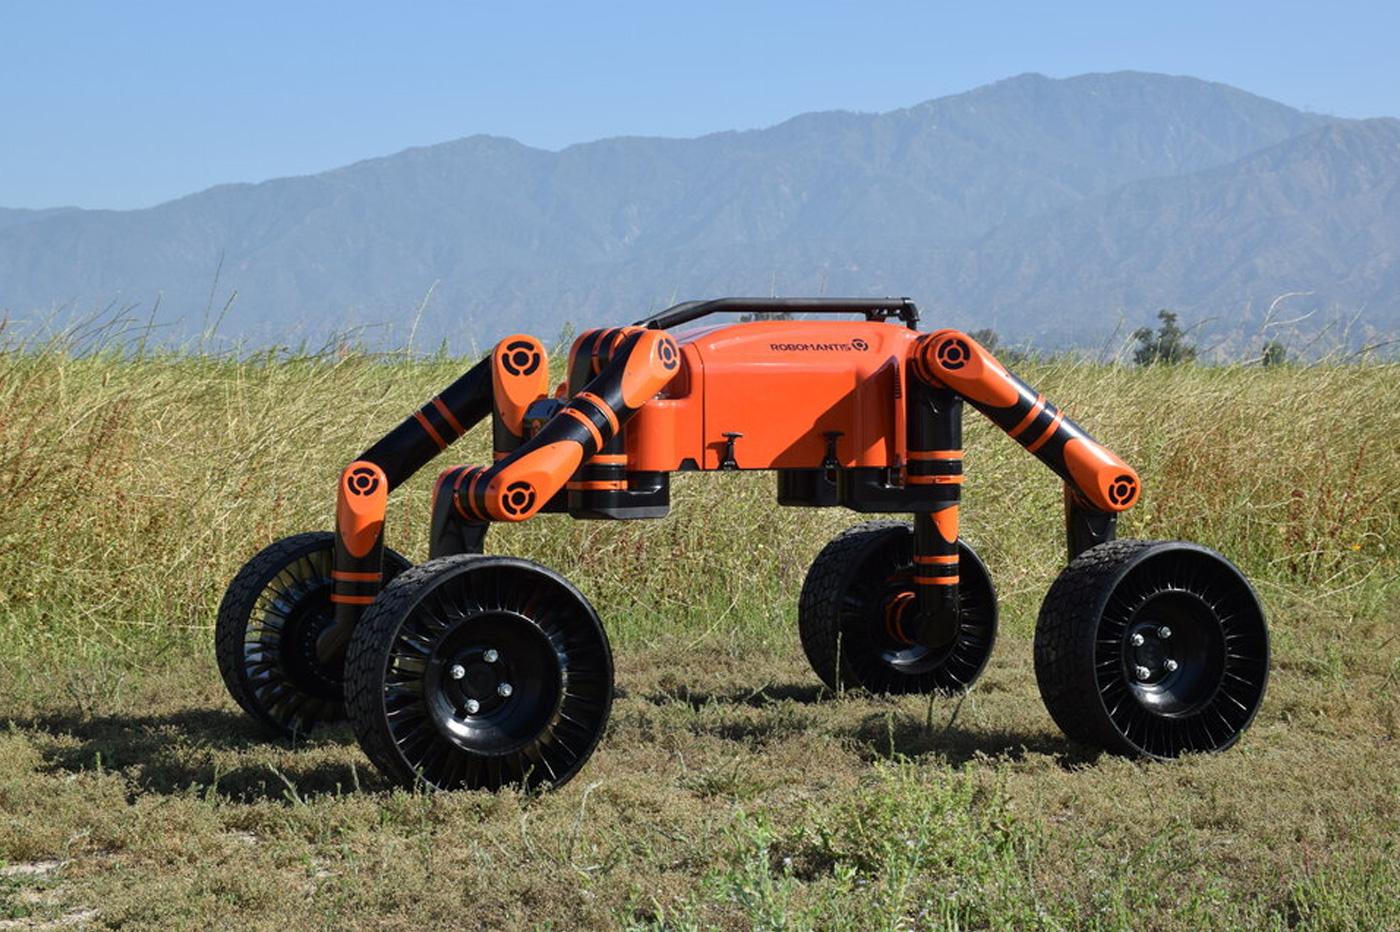 Motiv Robotics